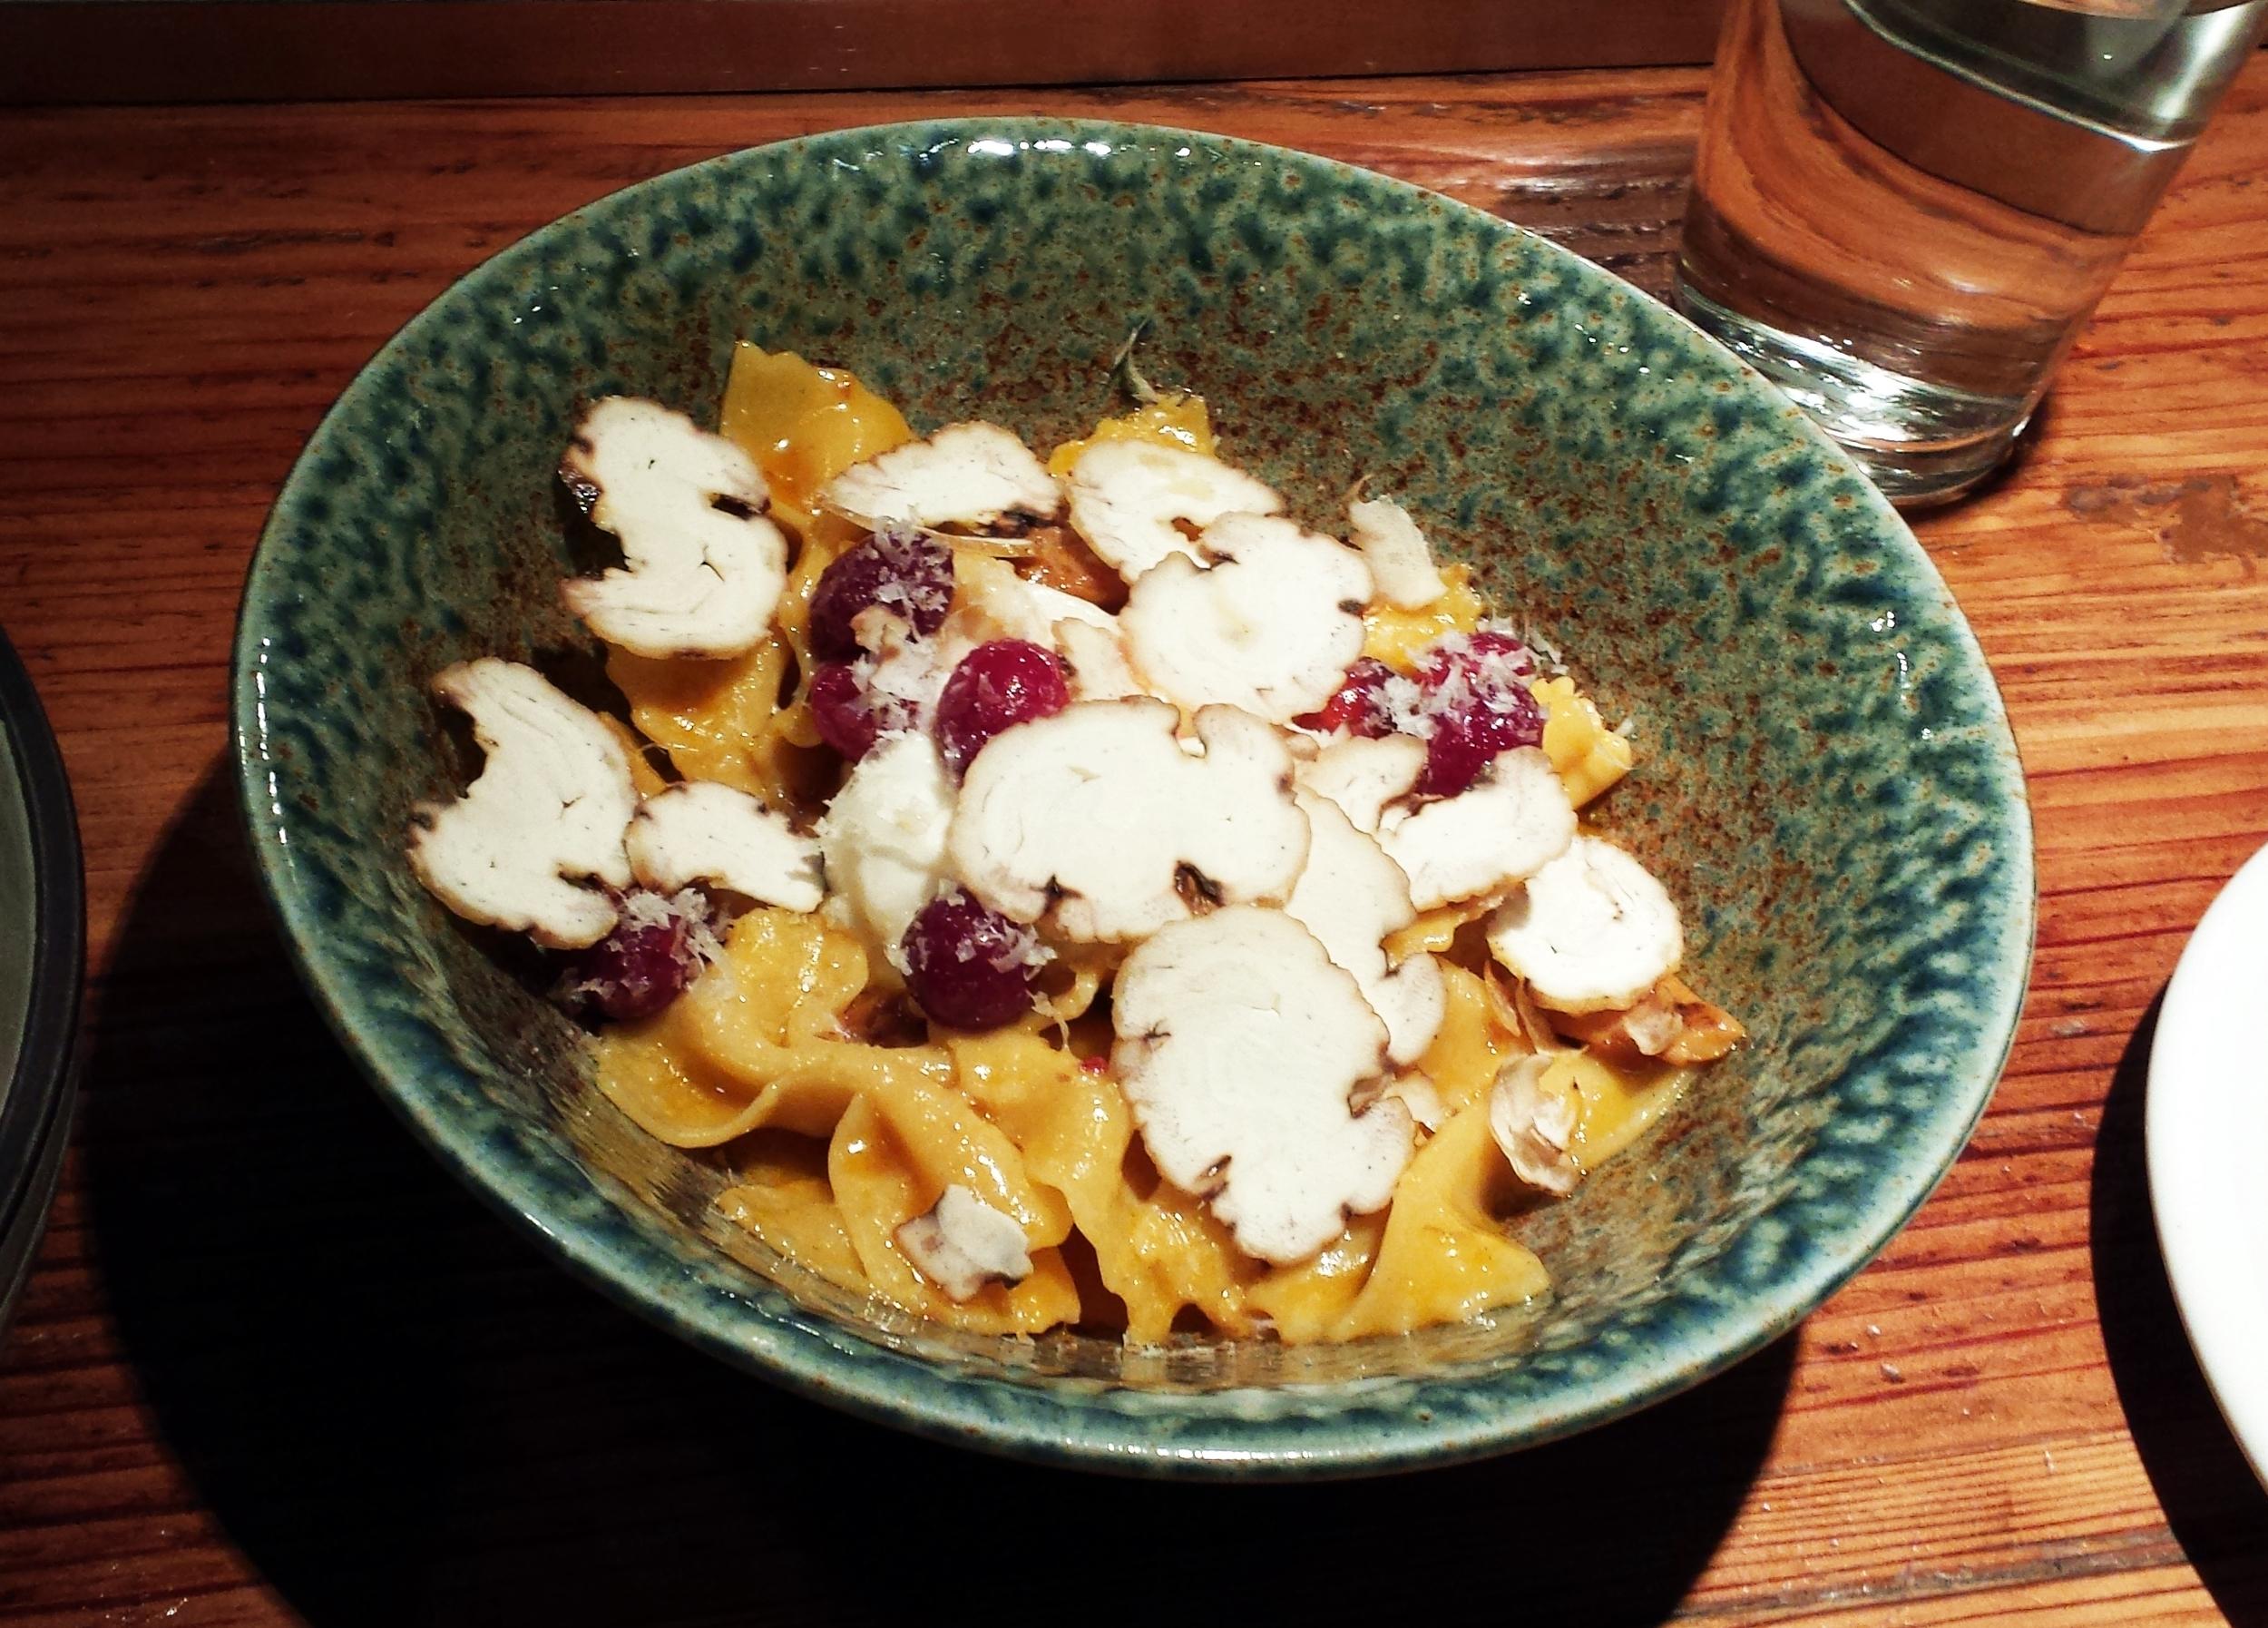 Bowtie pasta with pumpkin butter, cranberries, & chestnuts